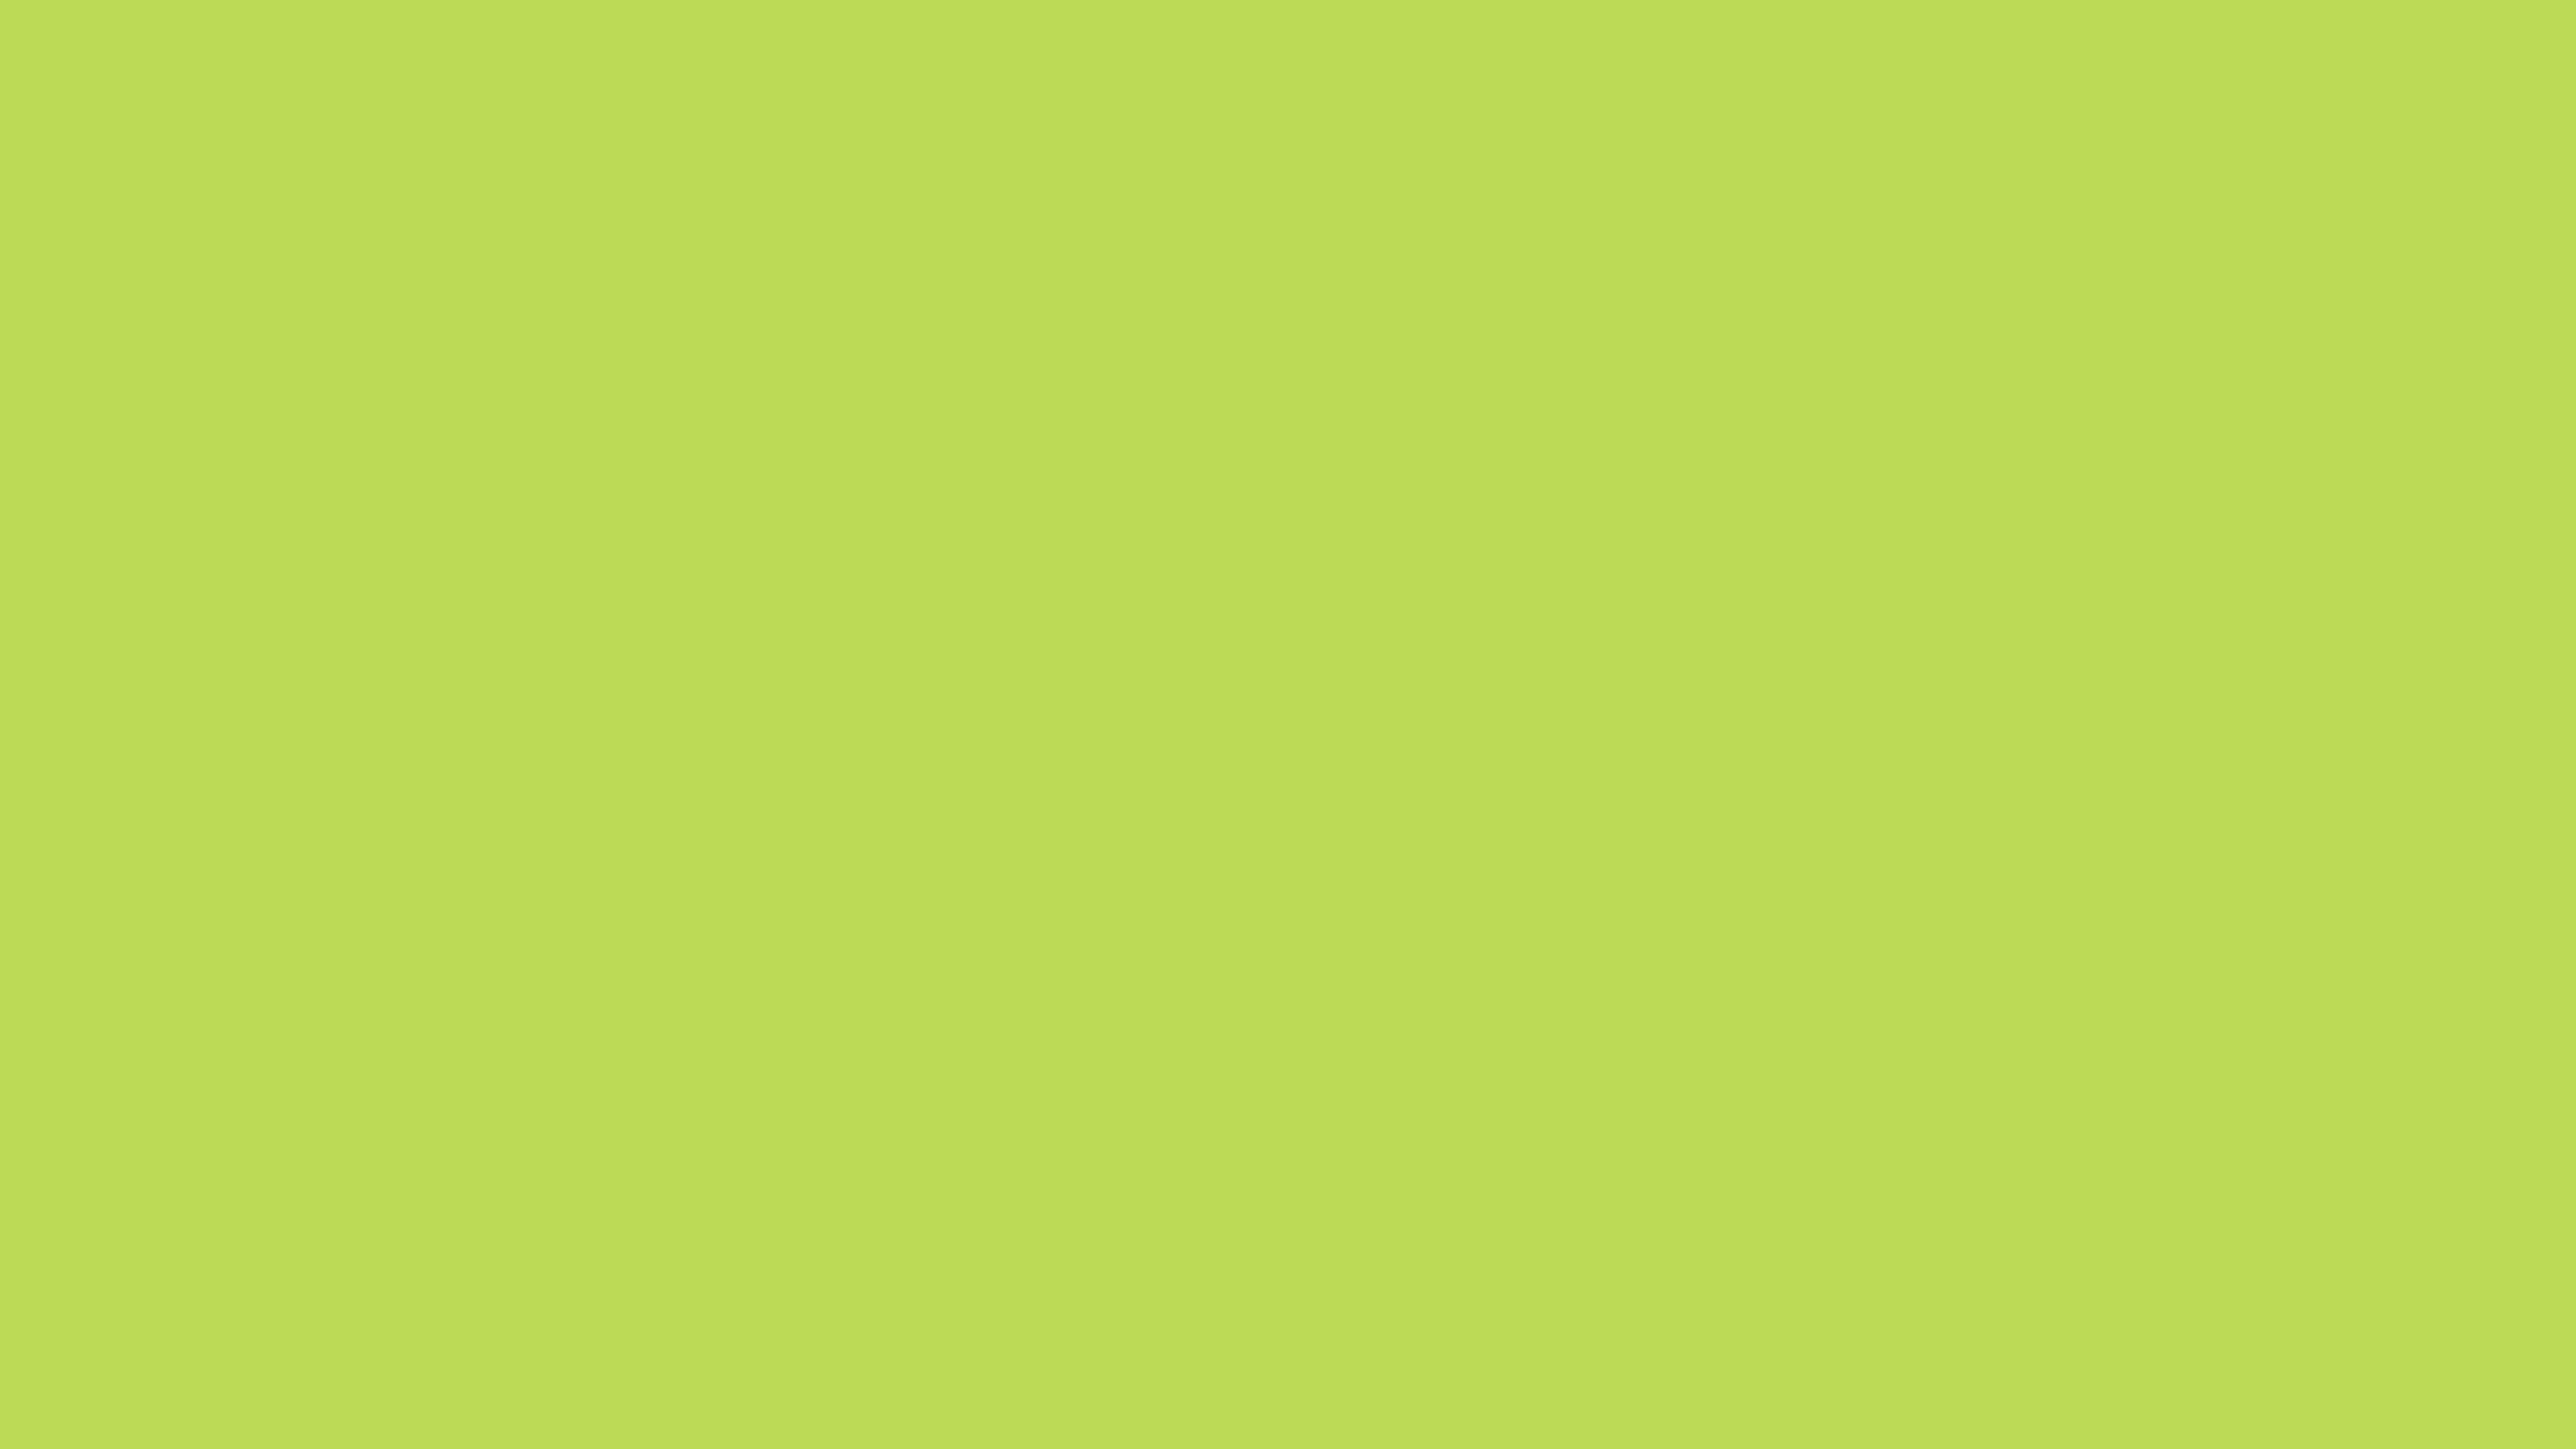 7680x4320 June Bud Solid Color Background